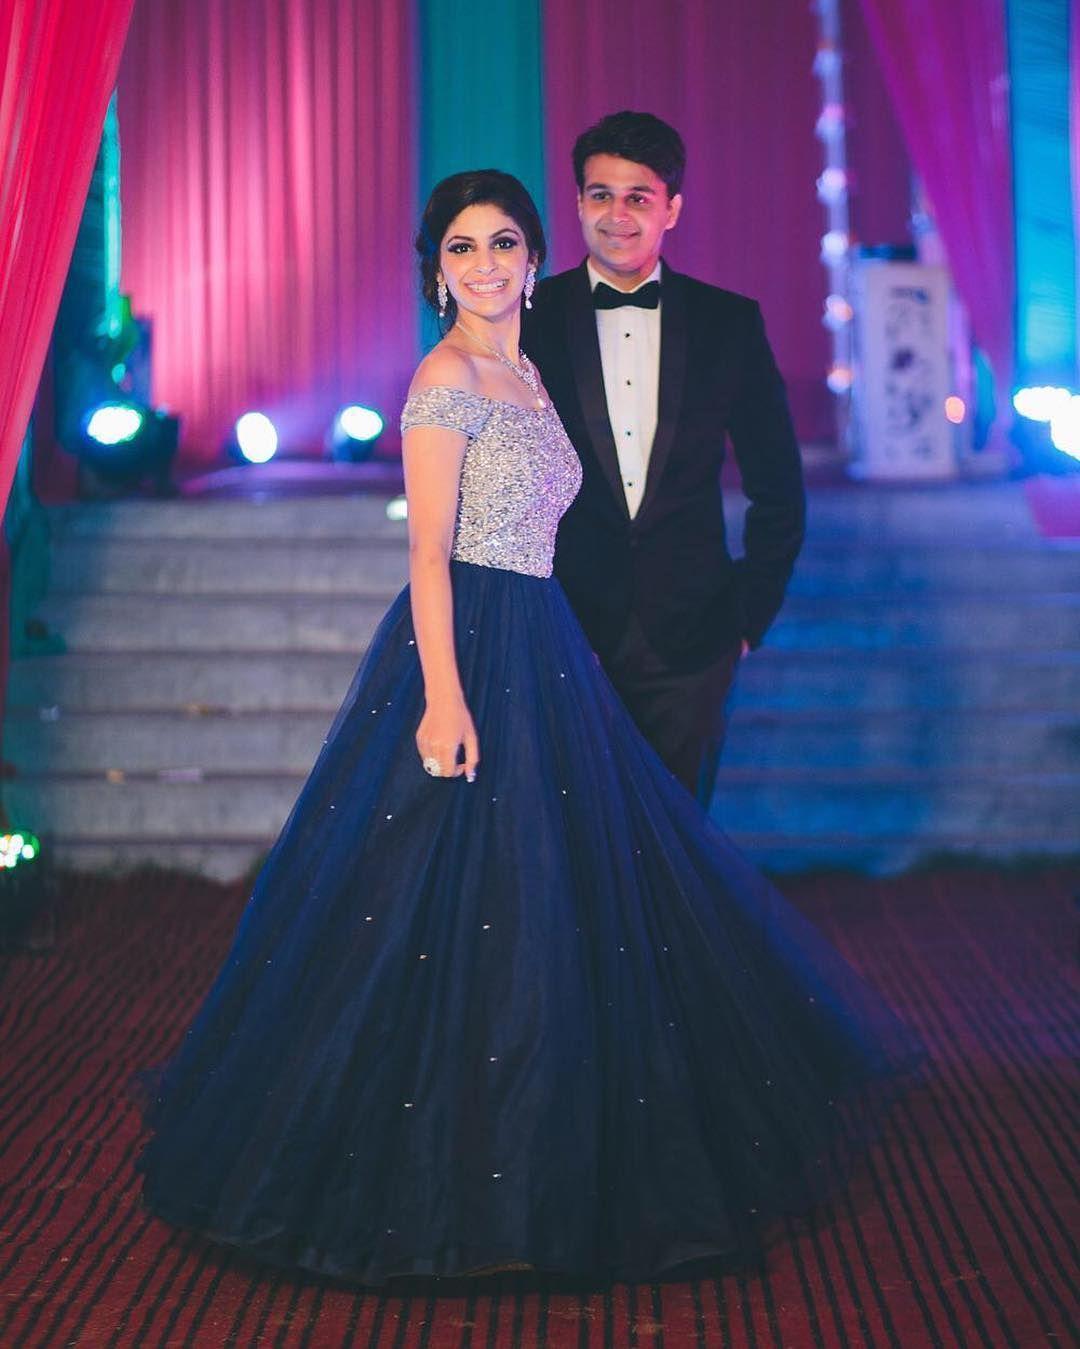 """Purbsha Shares Her Fairytale Moment With Her Groom Sahil"